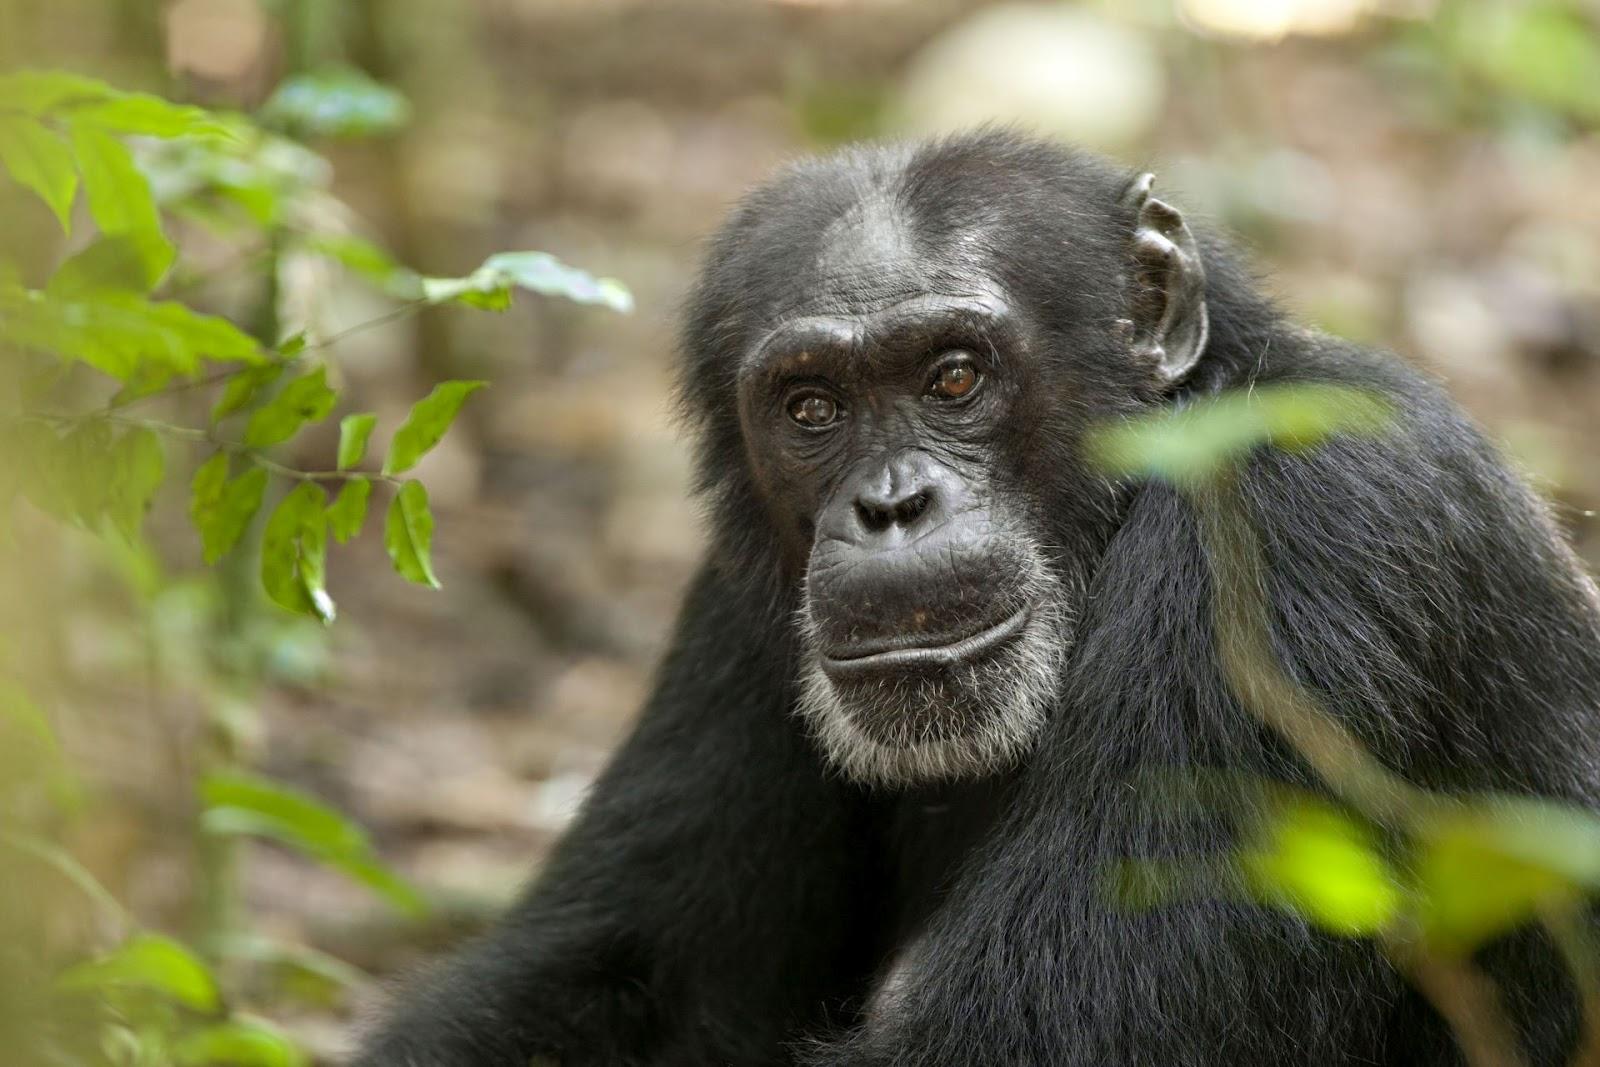 Chimpanzee on Life Cycles Of Animals